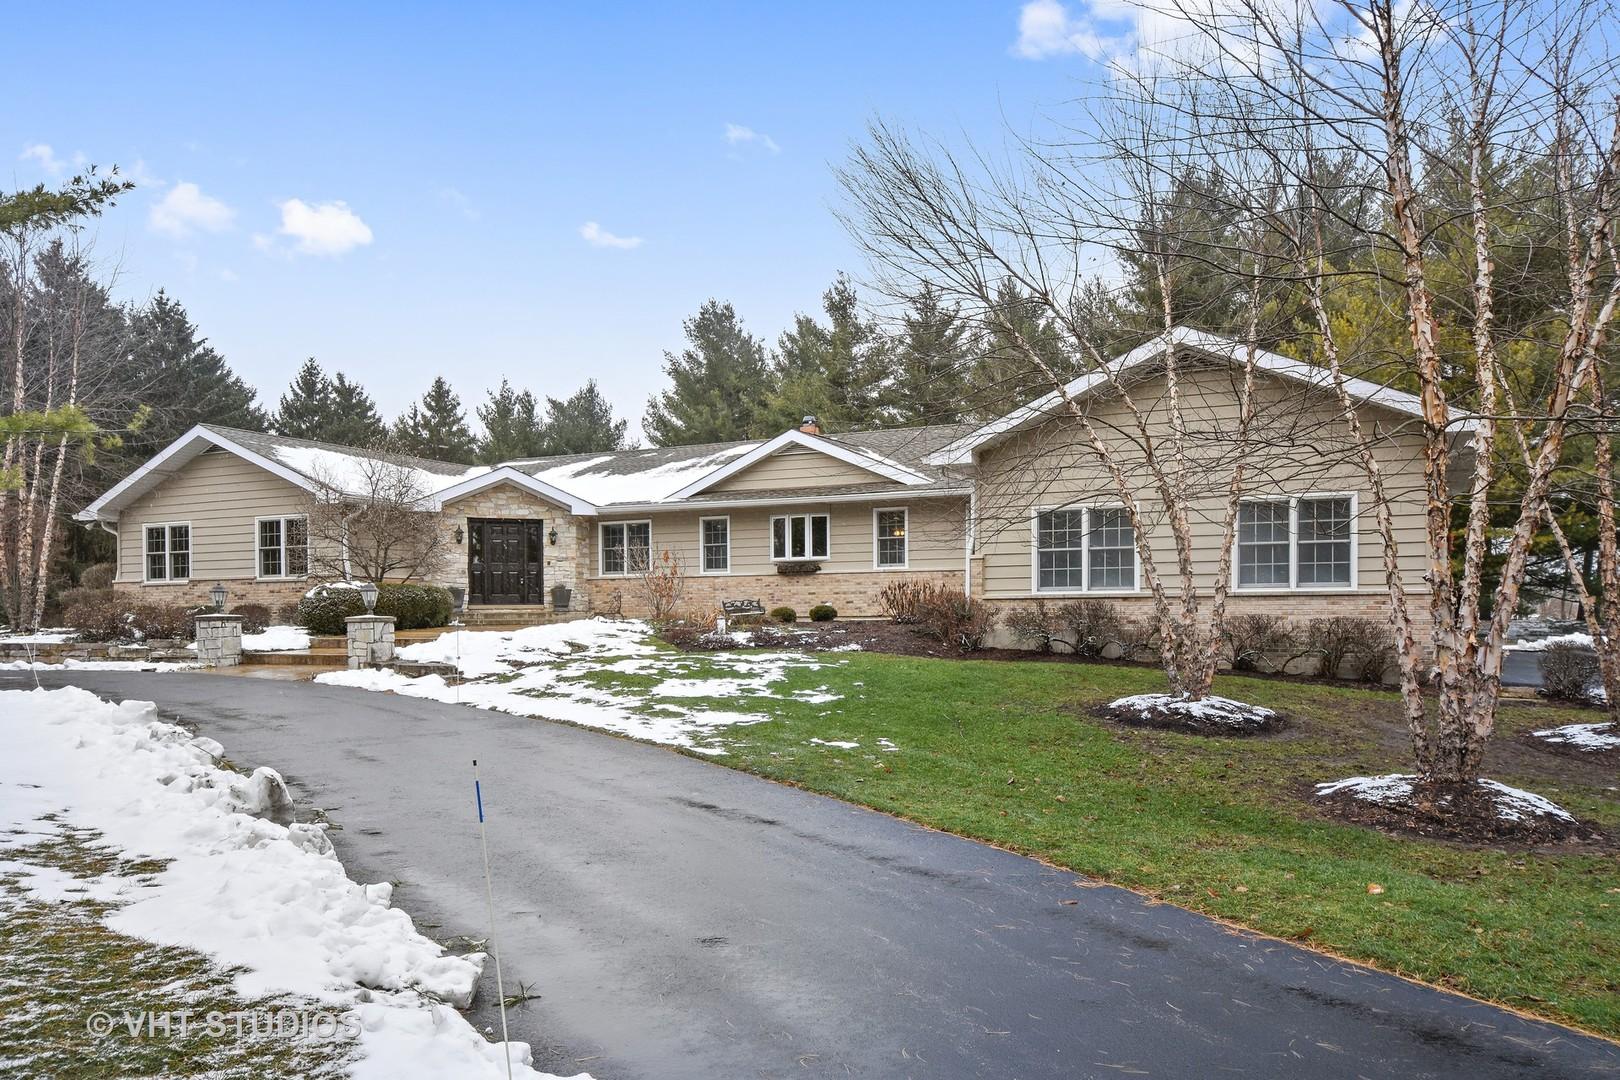 25747 North Kyle Court, Hawthorn Woods, Illinois 60047